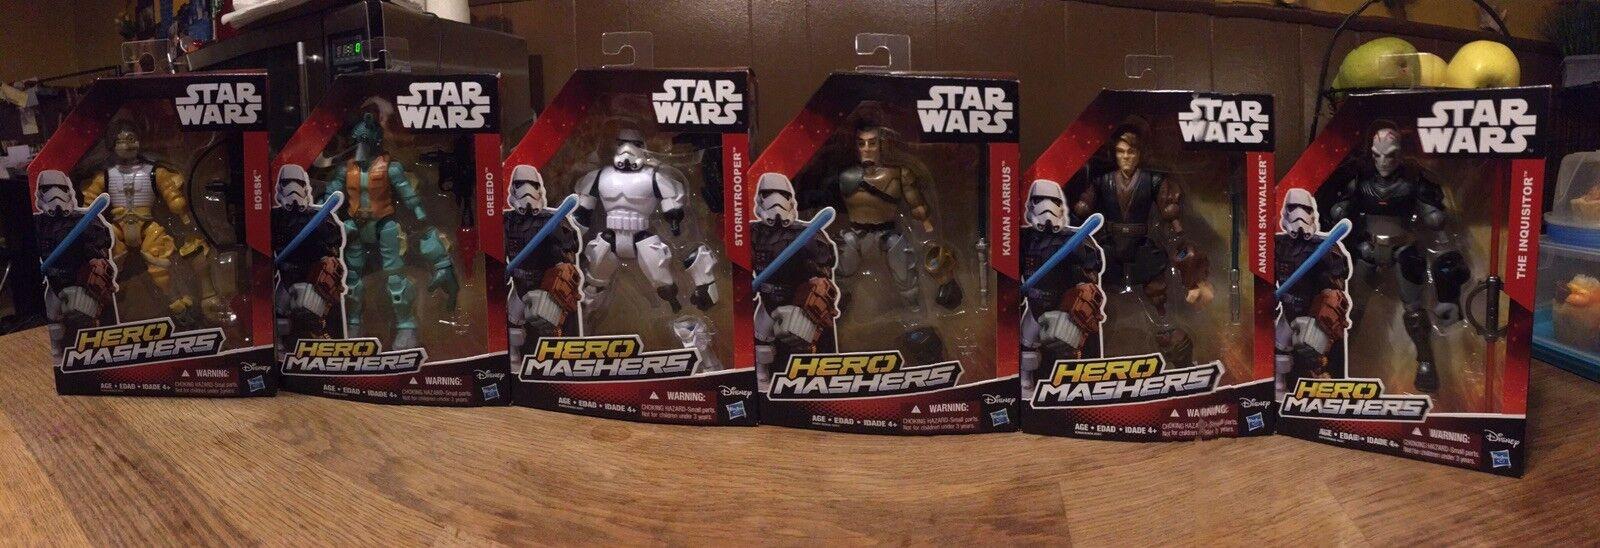 Lot  Of 6 Hasbro Star Wars HERO MASHERS